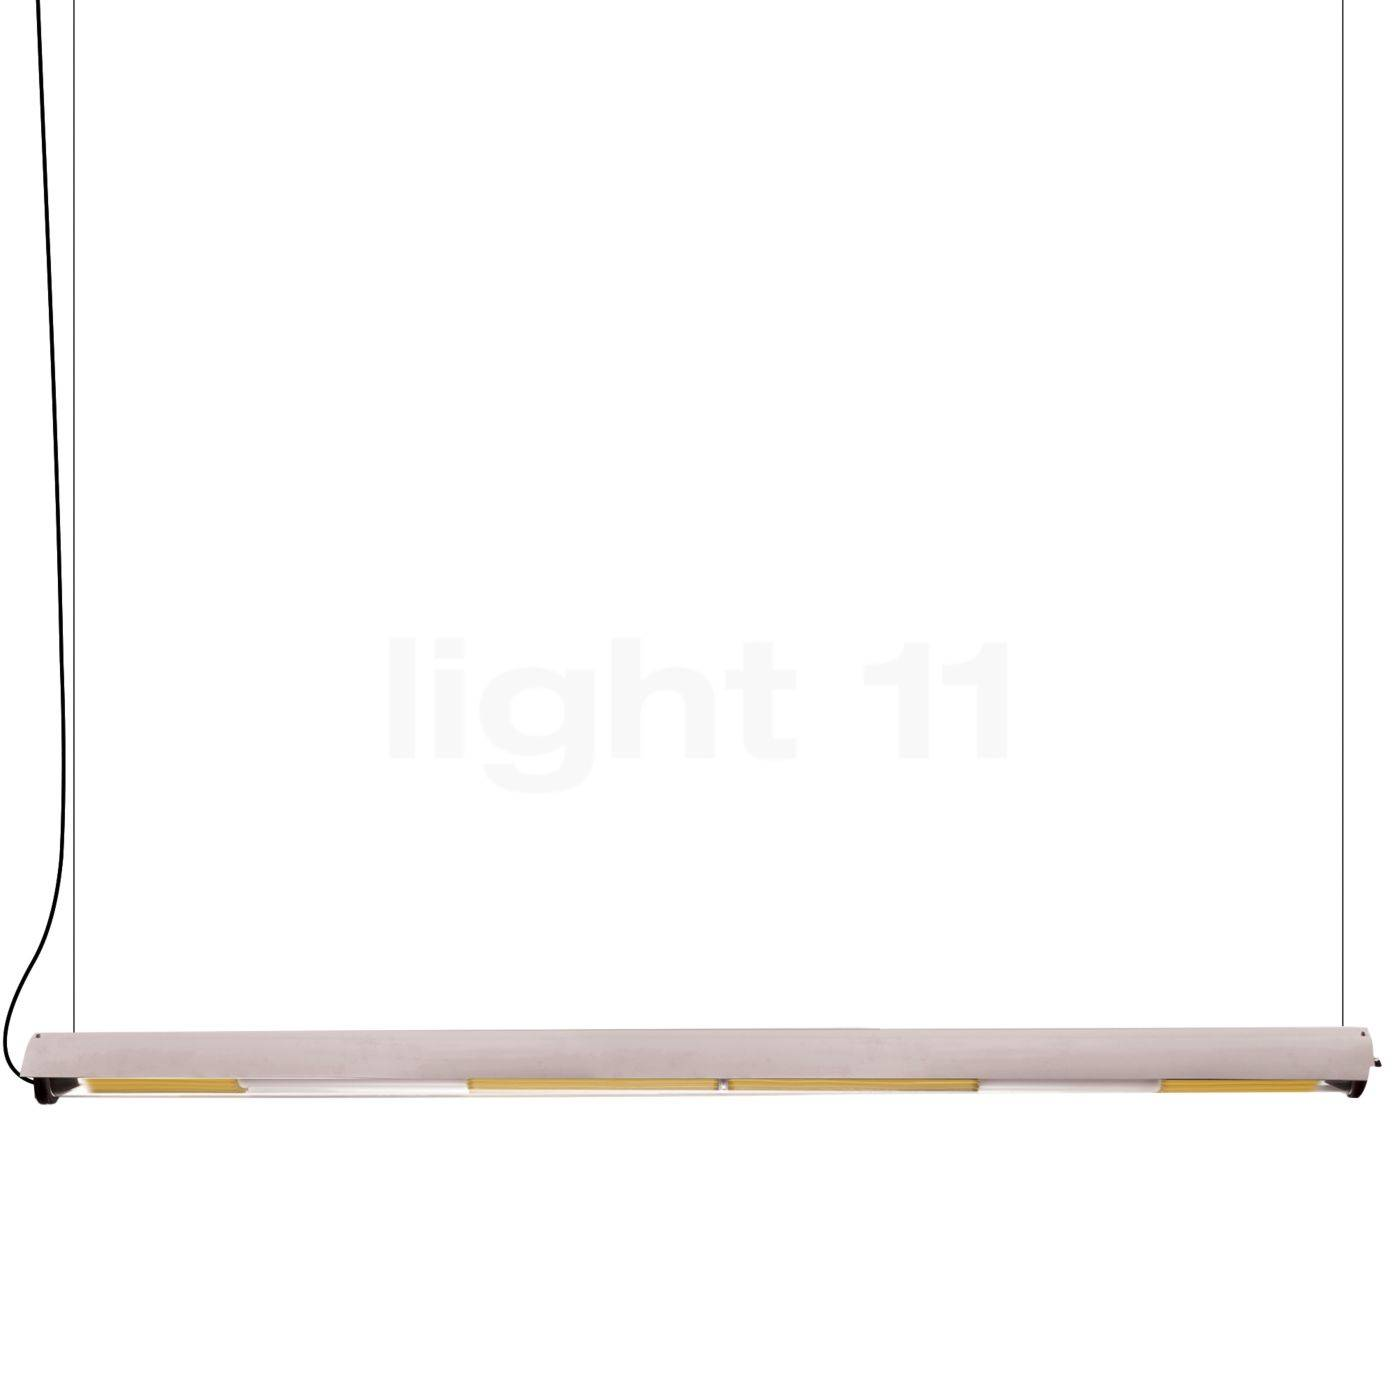 DCW In The Tube 360° - 1600 Suspension LED avec FLAP, volet blanc/maille dorée